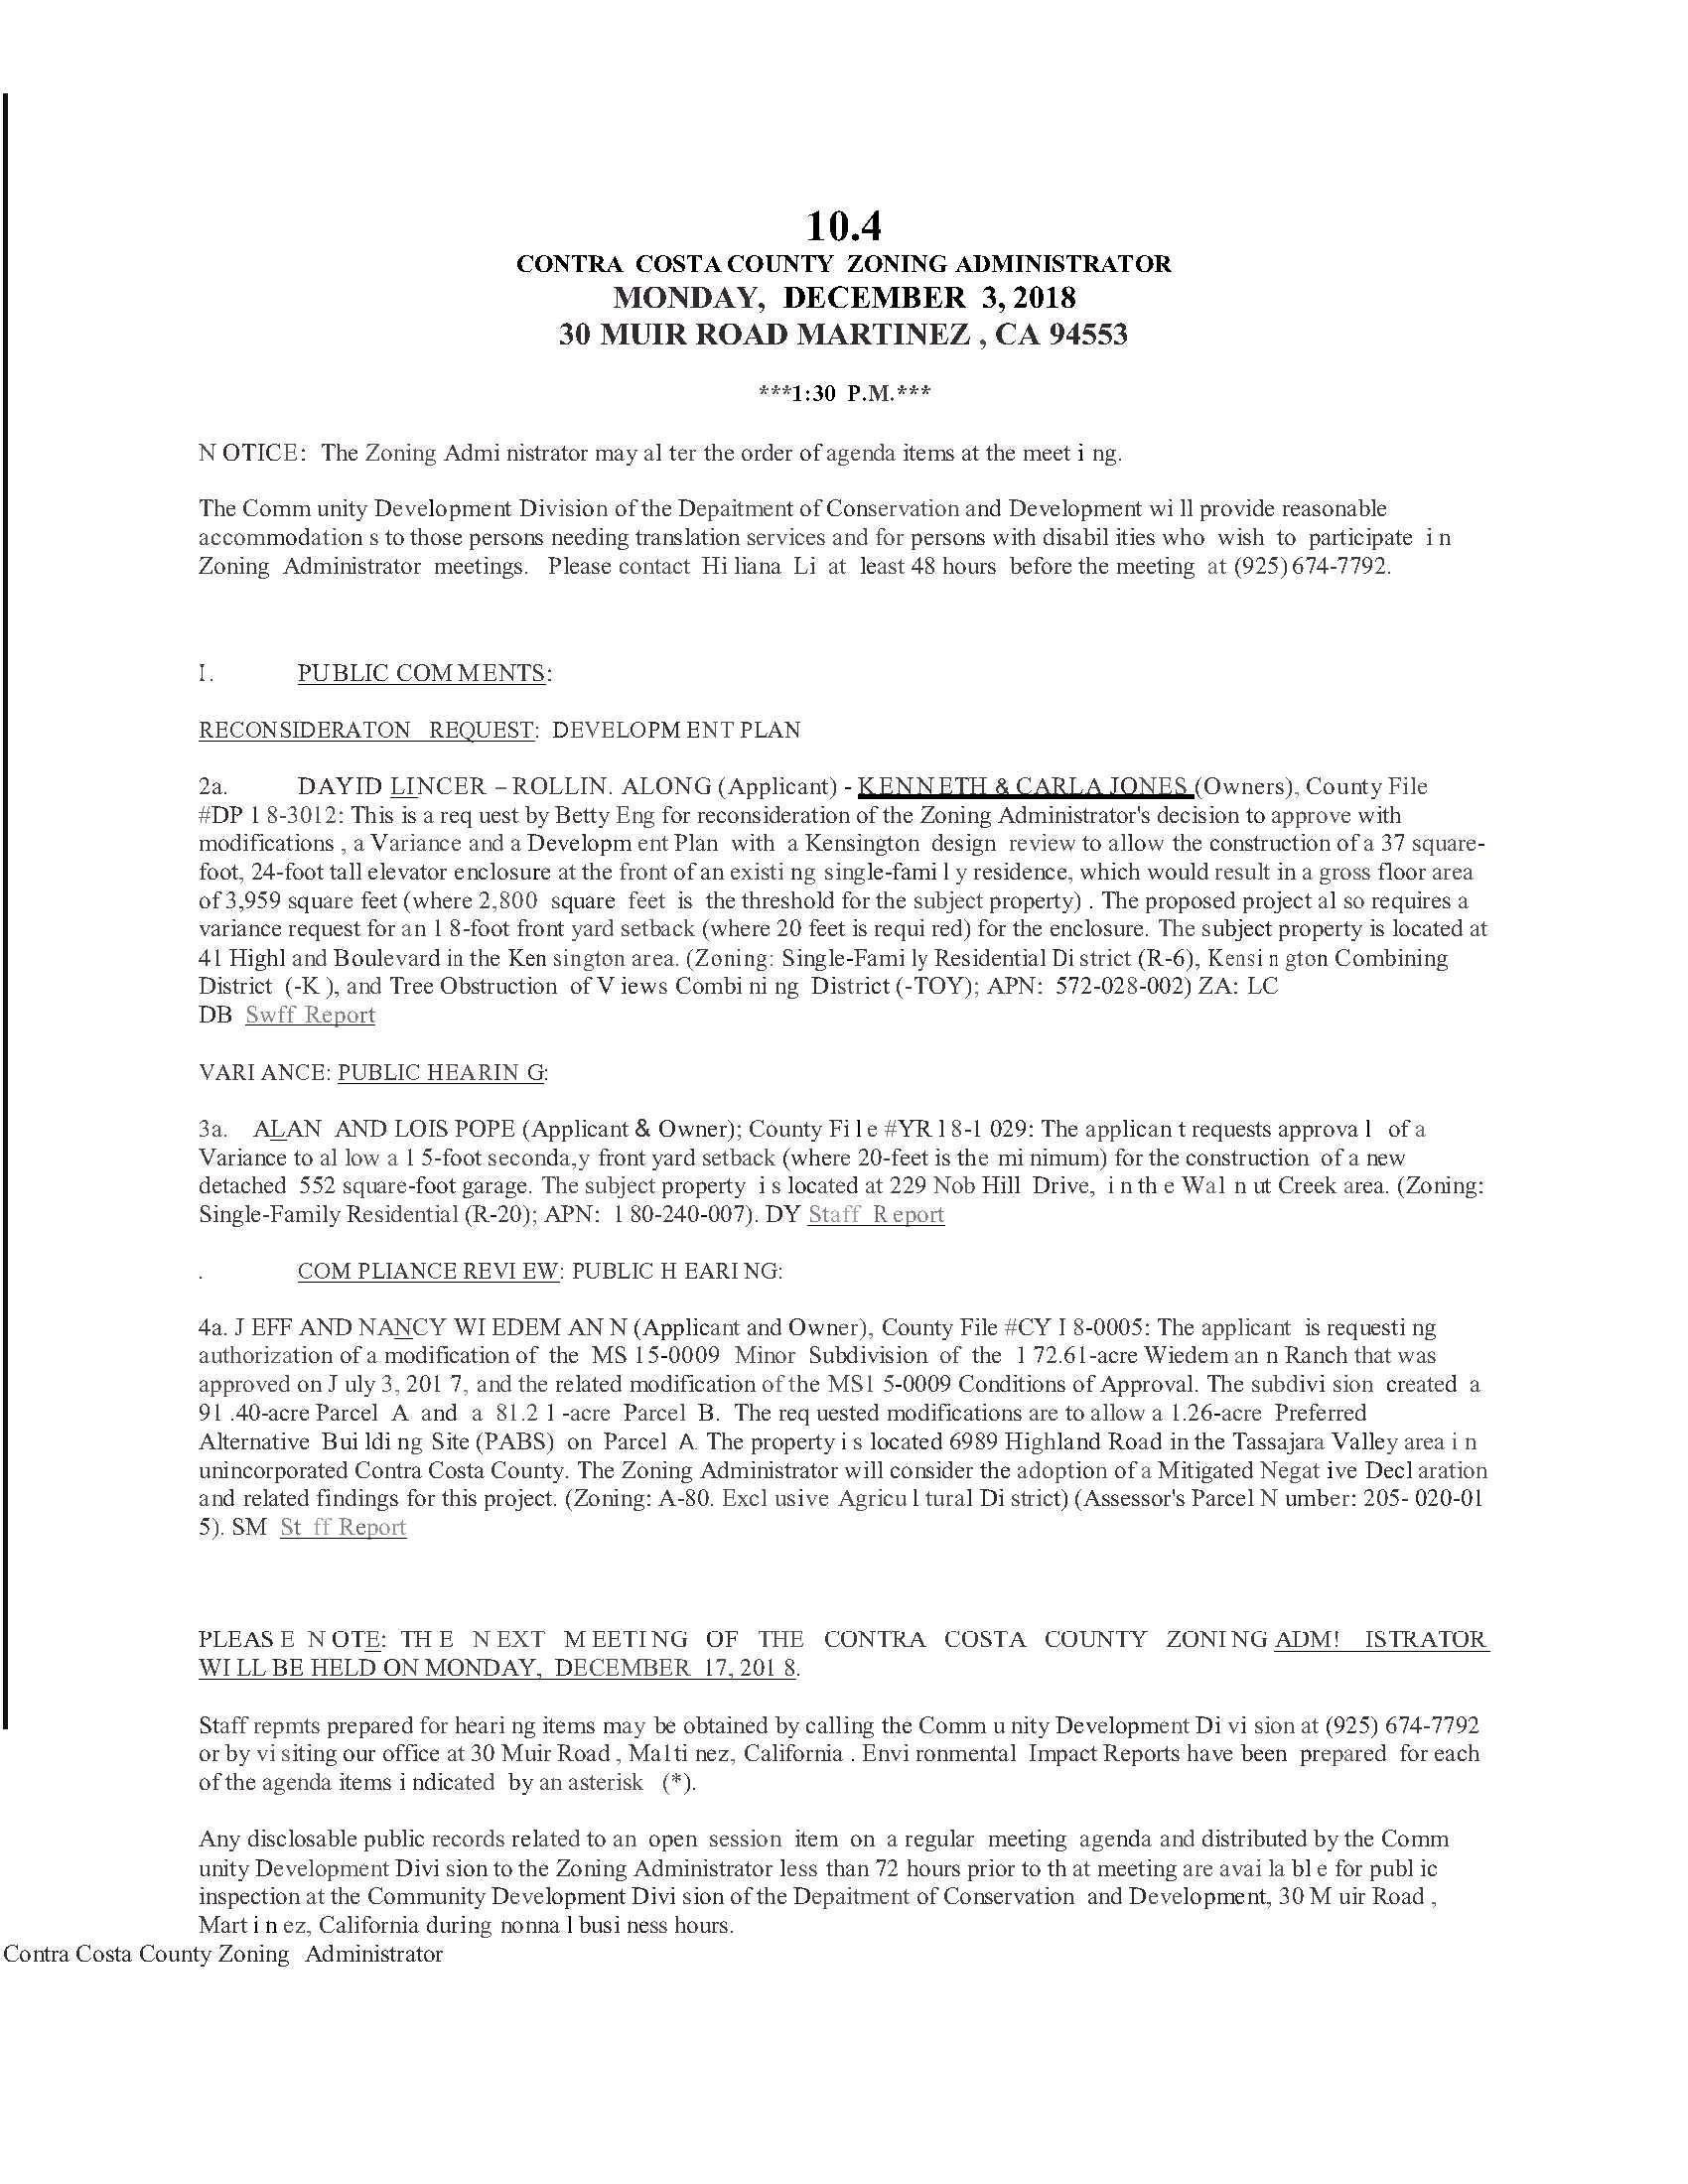 ESMAC Agenda 12.13.2018 (51 Pages)_34.jpg